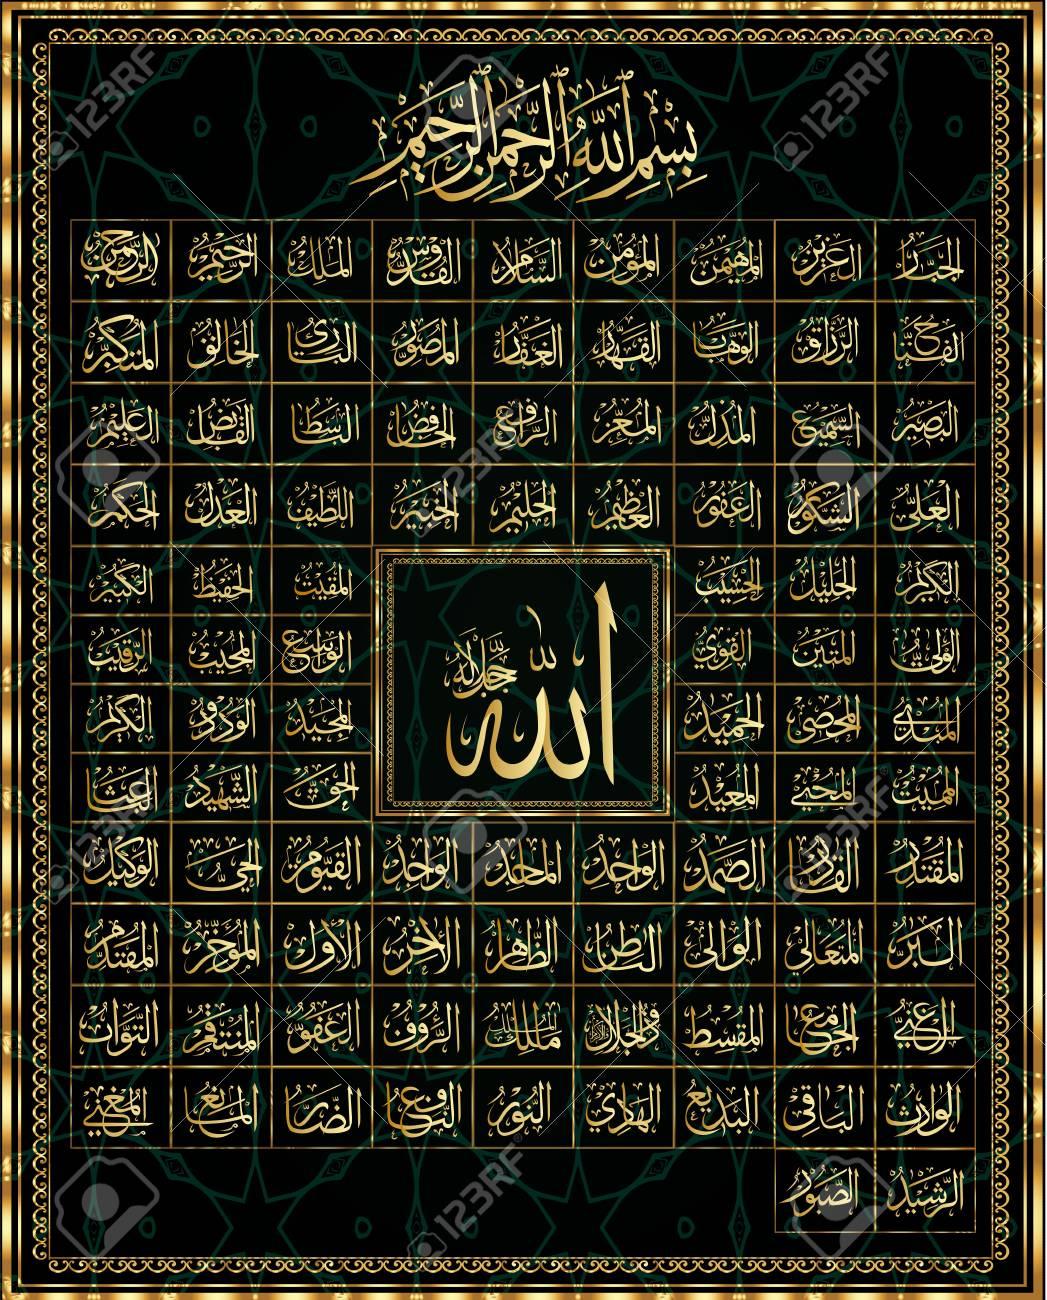 99 names of Allah. Vector illustration. - 97857821